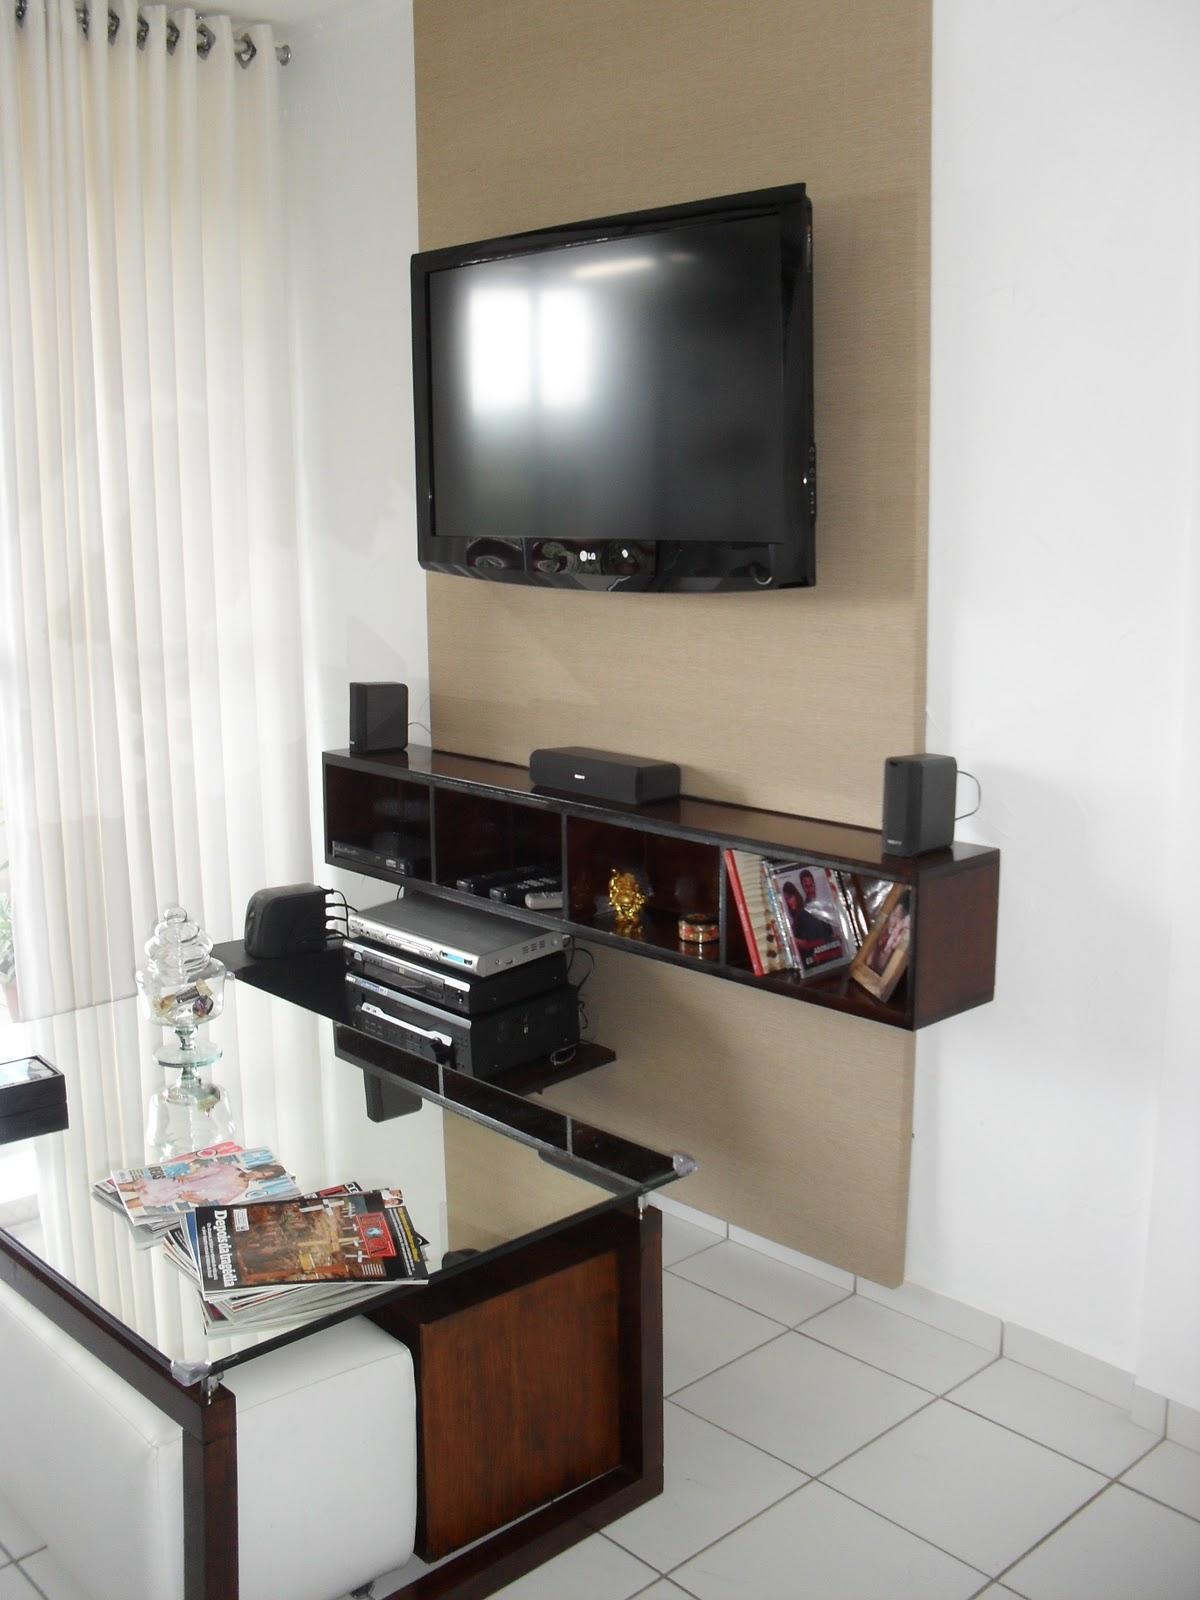 Ateliê da Alê: PAP Painel para TV de LCD #624437 1200x1600